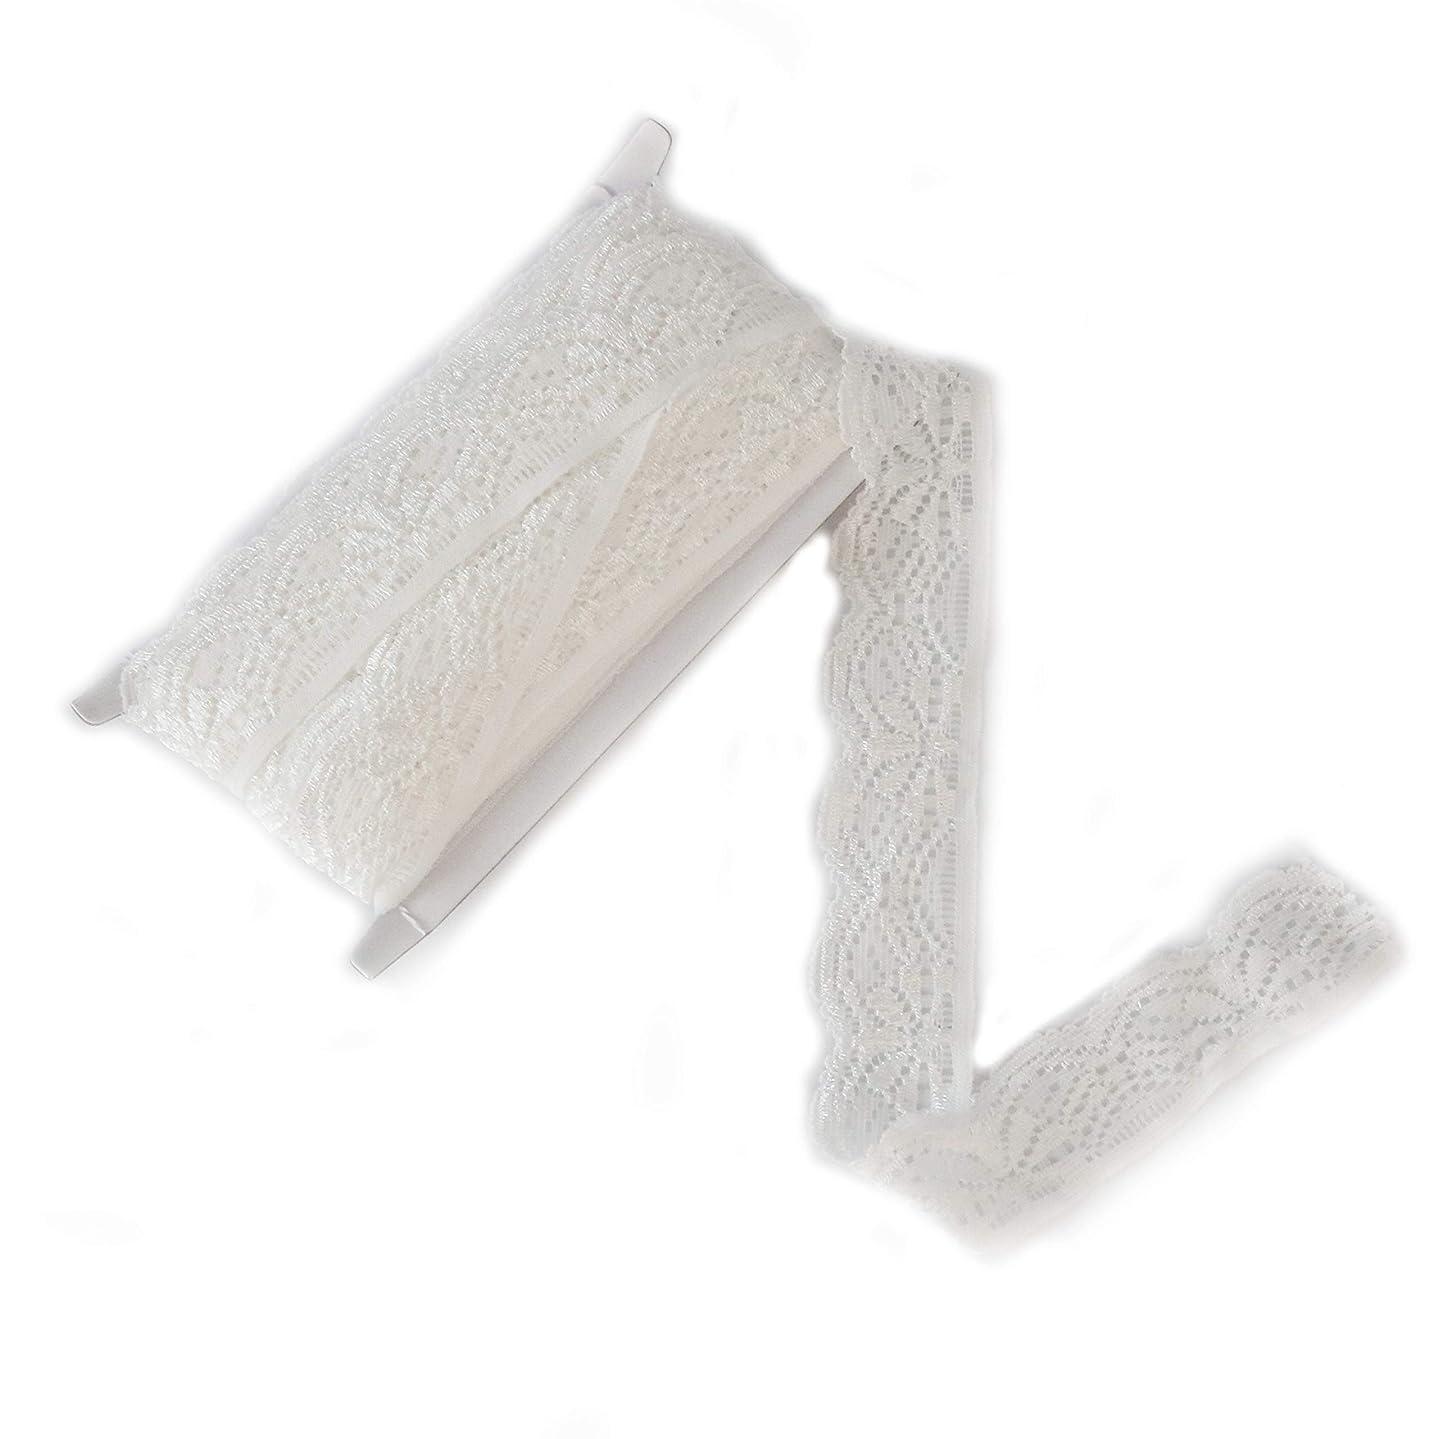 ELLAMAMA Elastic Lace Trim Soft Stretch DIY Craft Delicate Ribbon Vintage 5/8 Inch Wide 10yds for Wedding Decorations Headbands Garters (white) ddr248590291